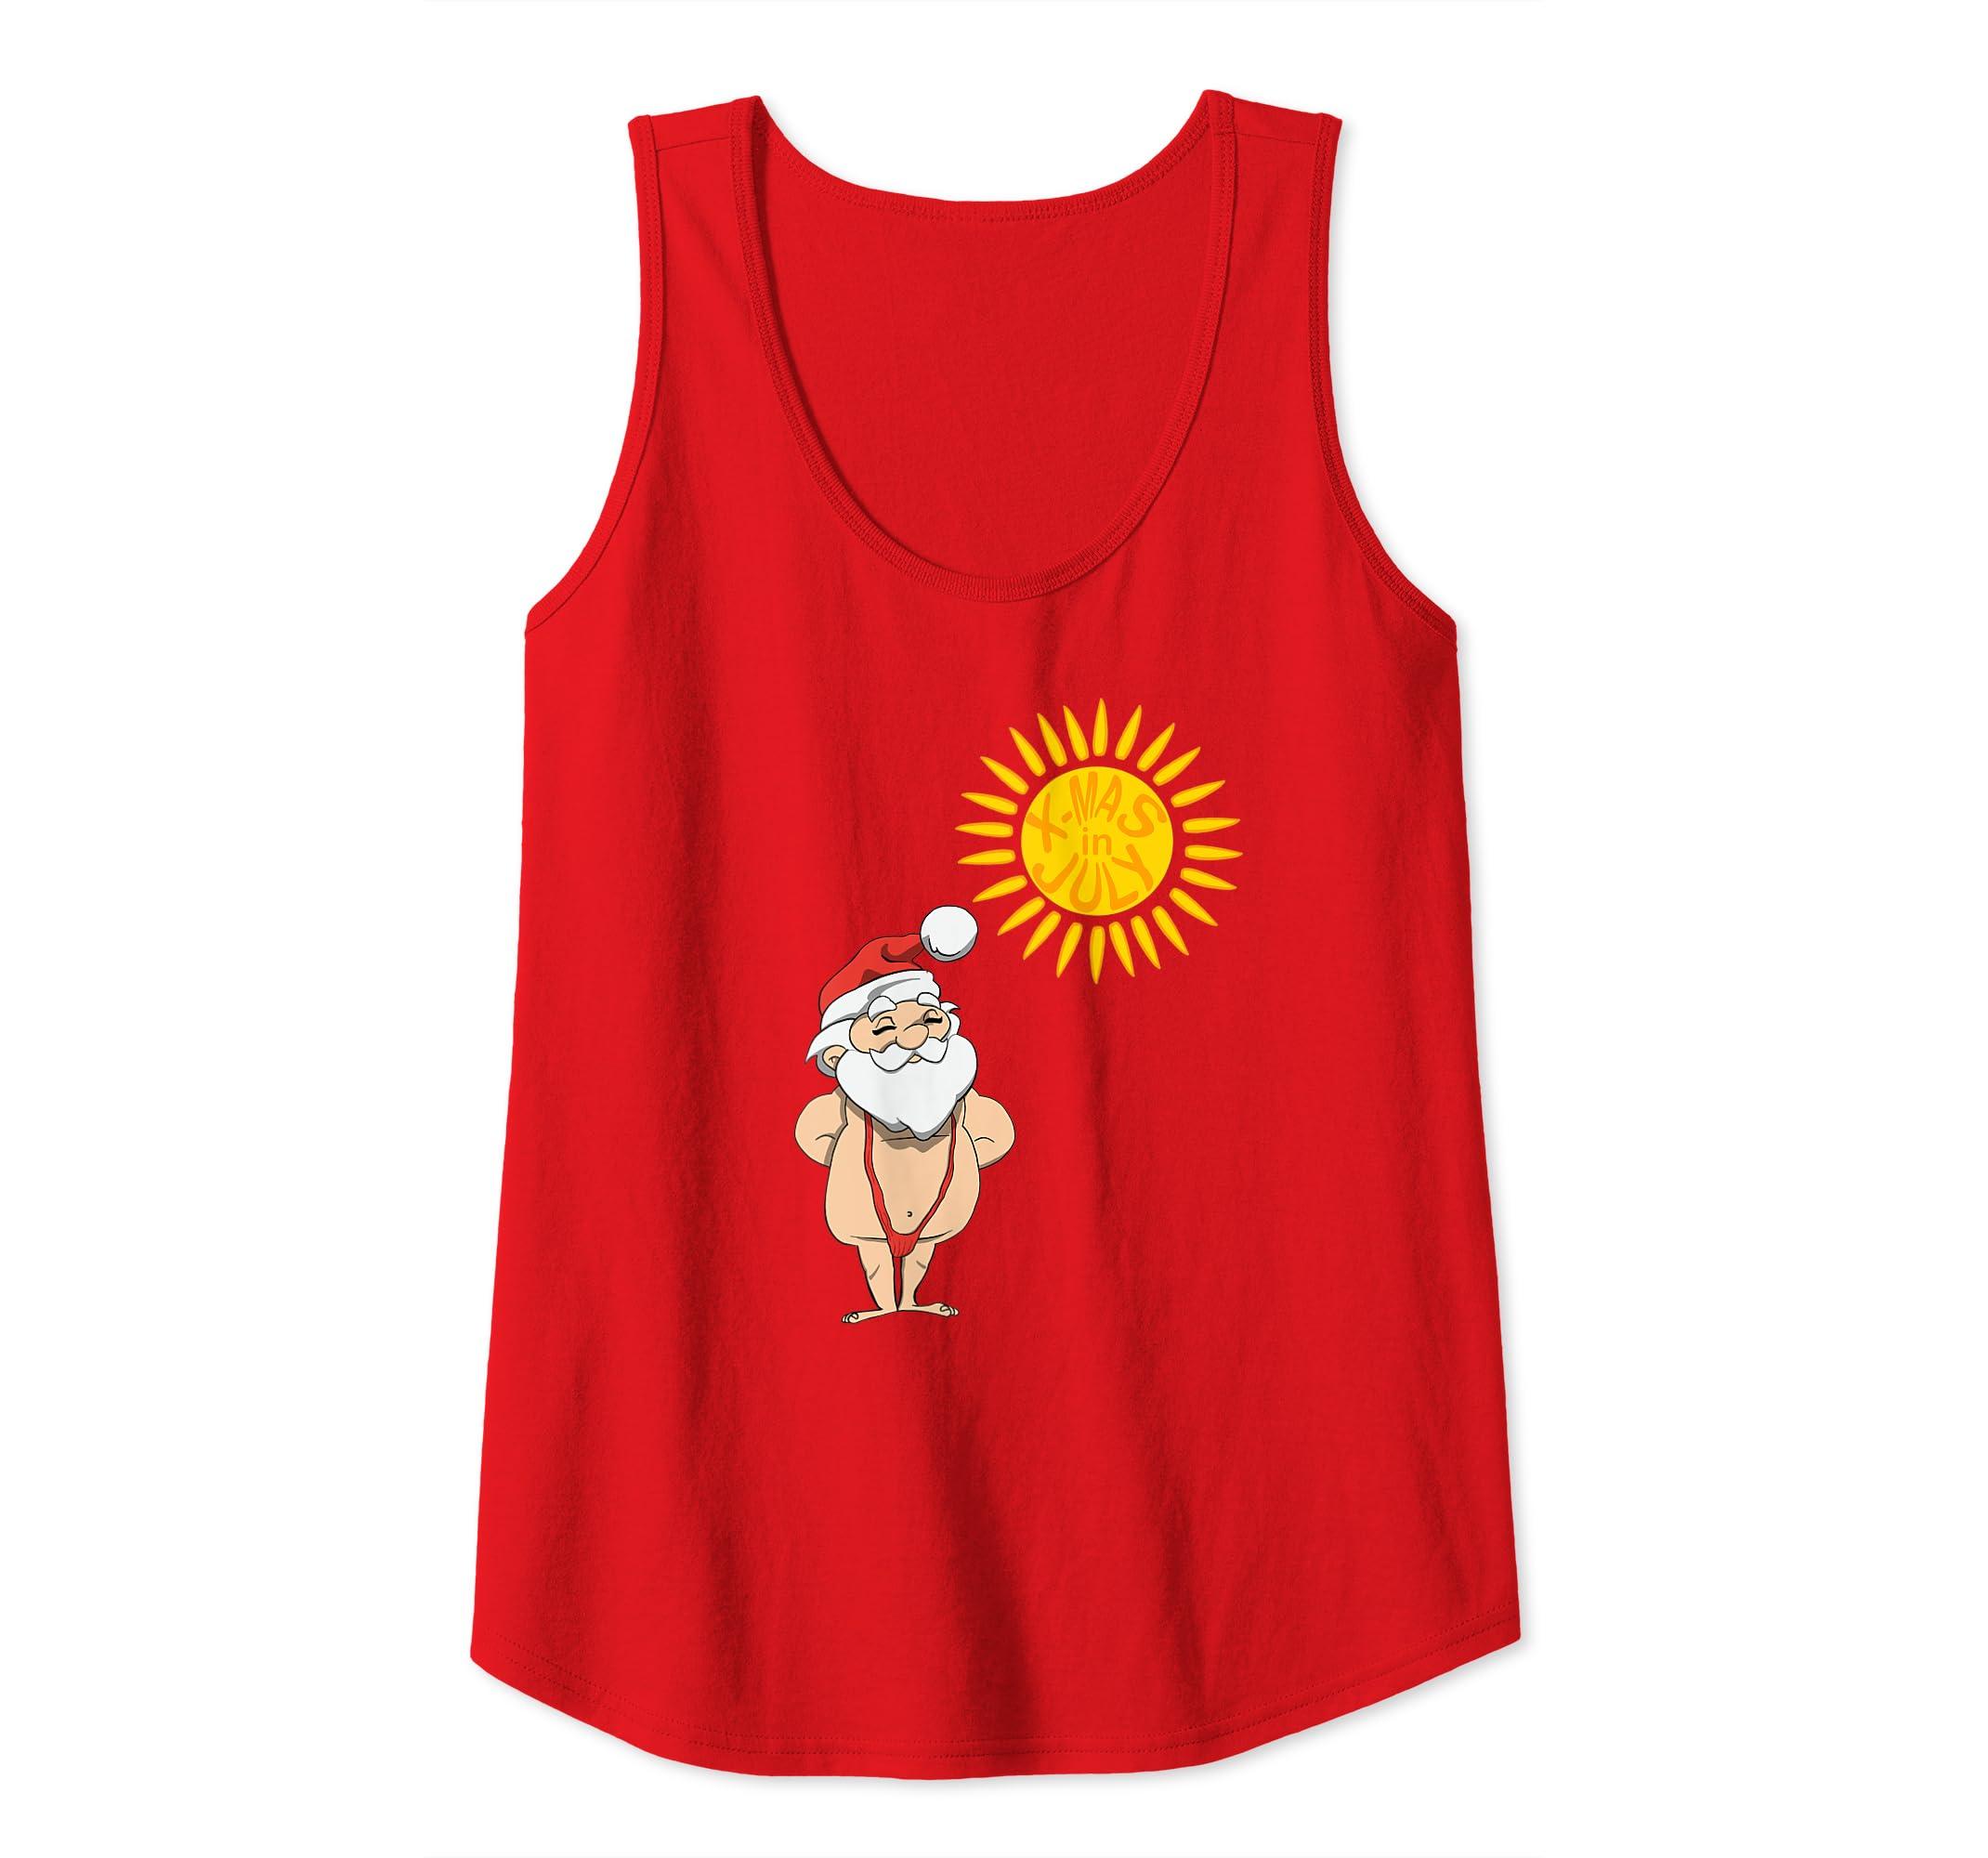 Christmas In July Swimsuit.Amazon Com Xmas In July Santa Sunbathing In Red Mankini